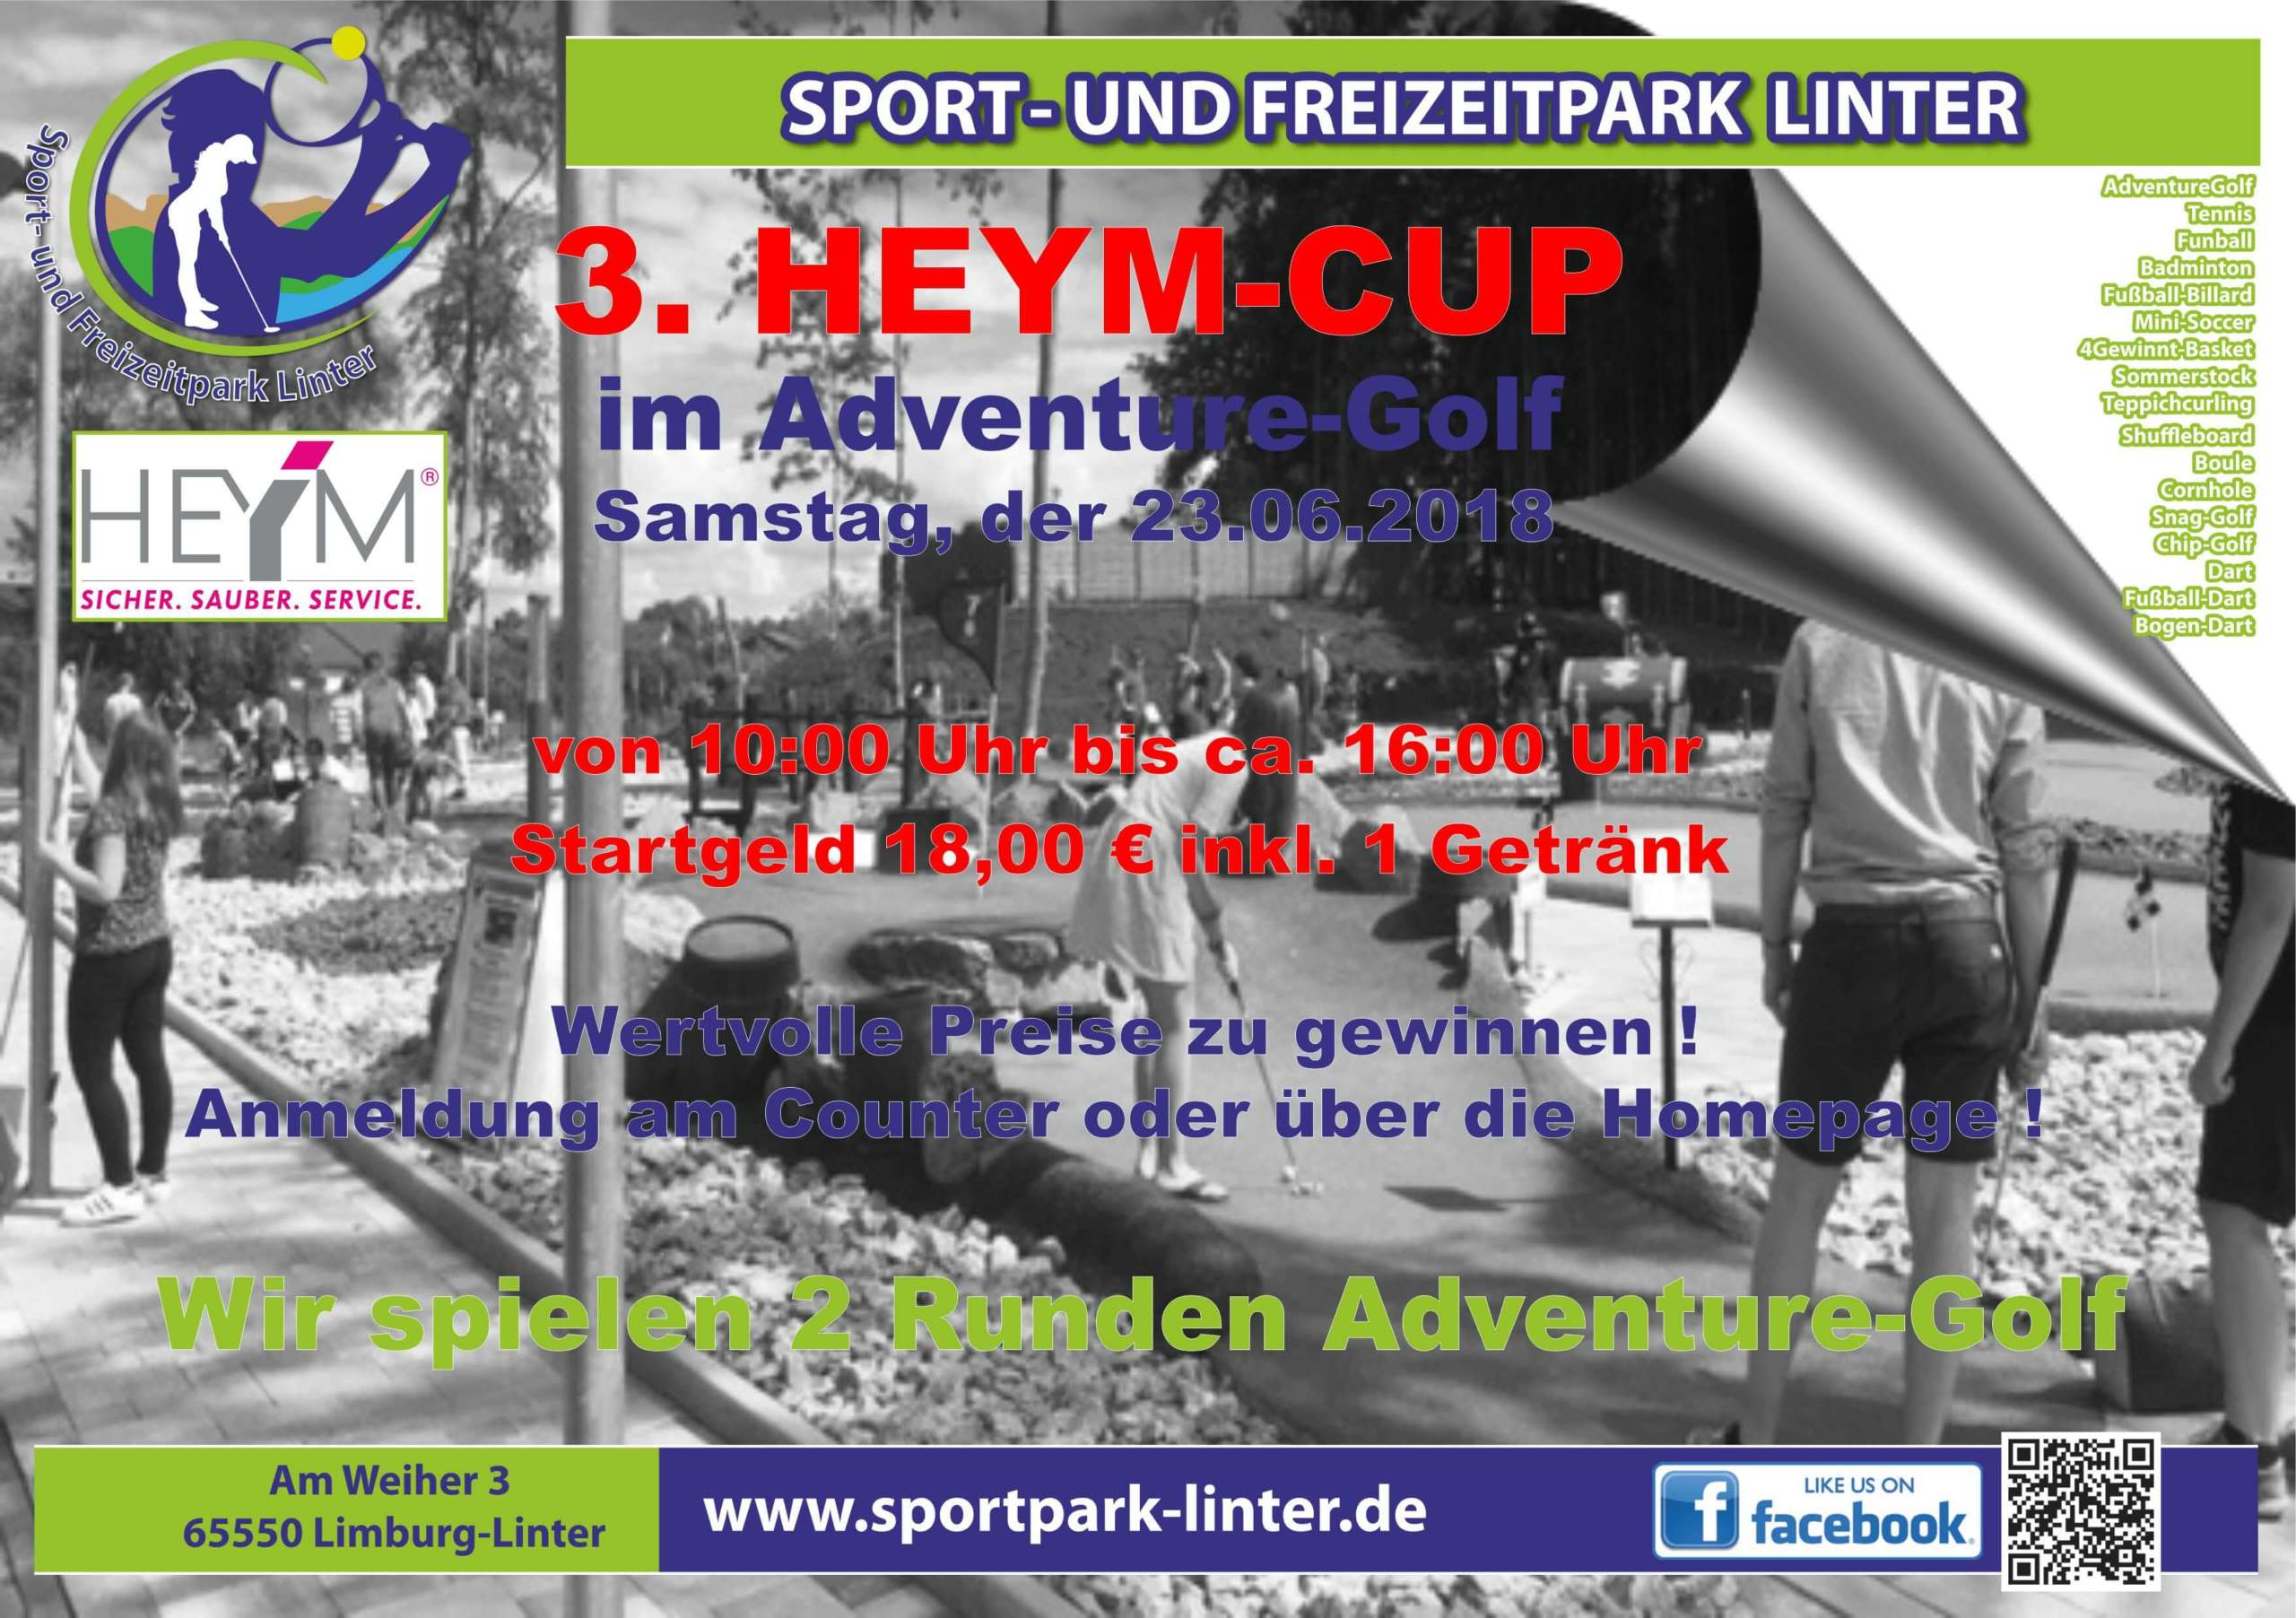 3. HEYM-CUP 2018